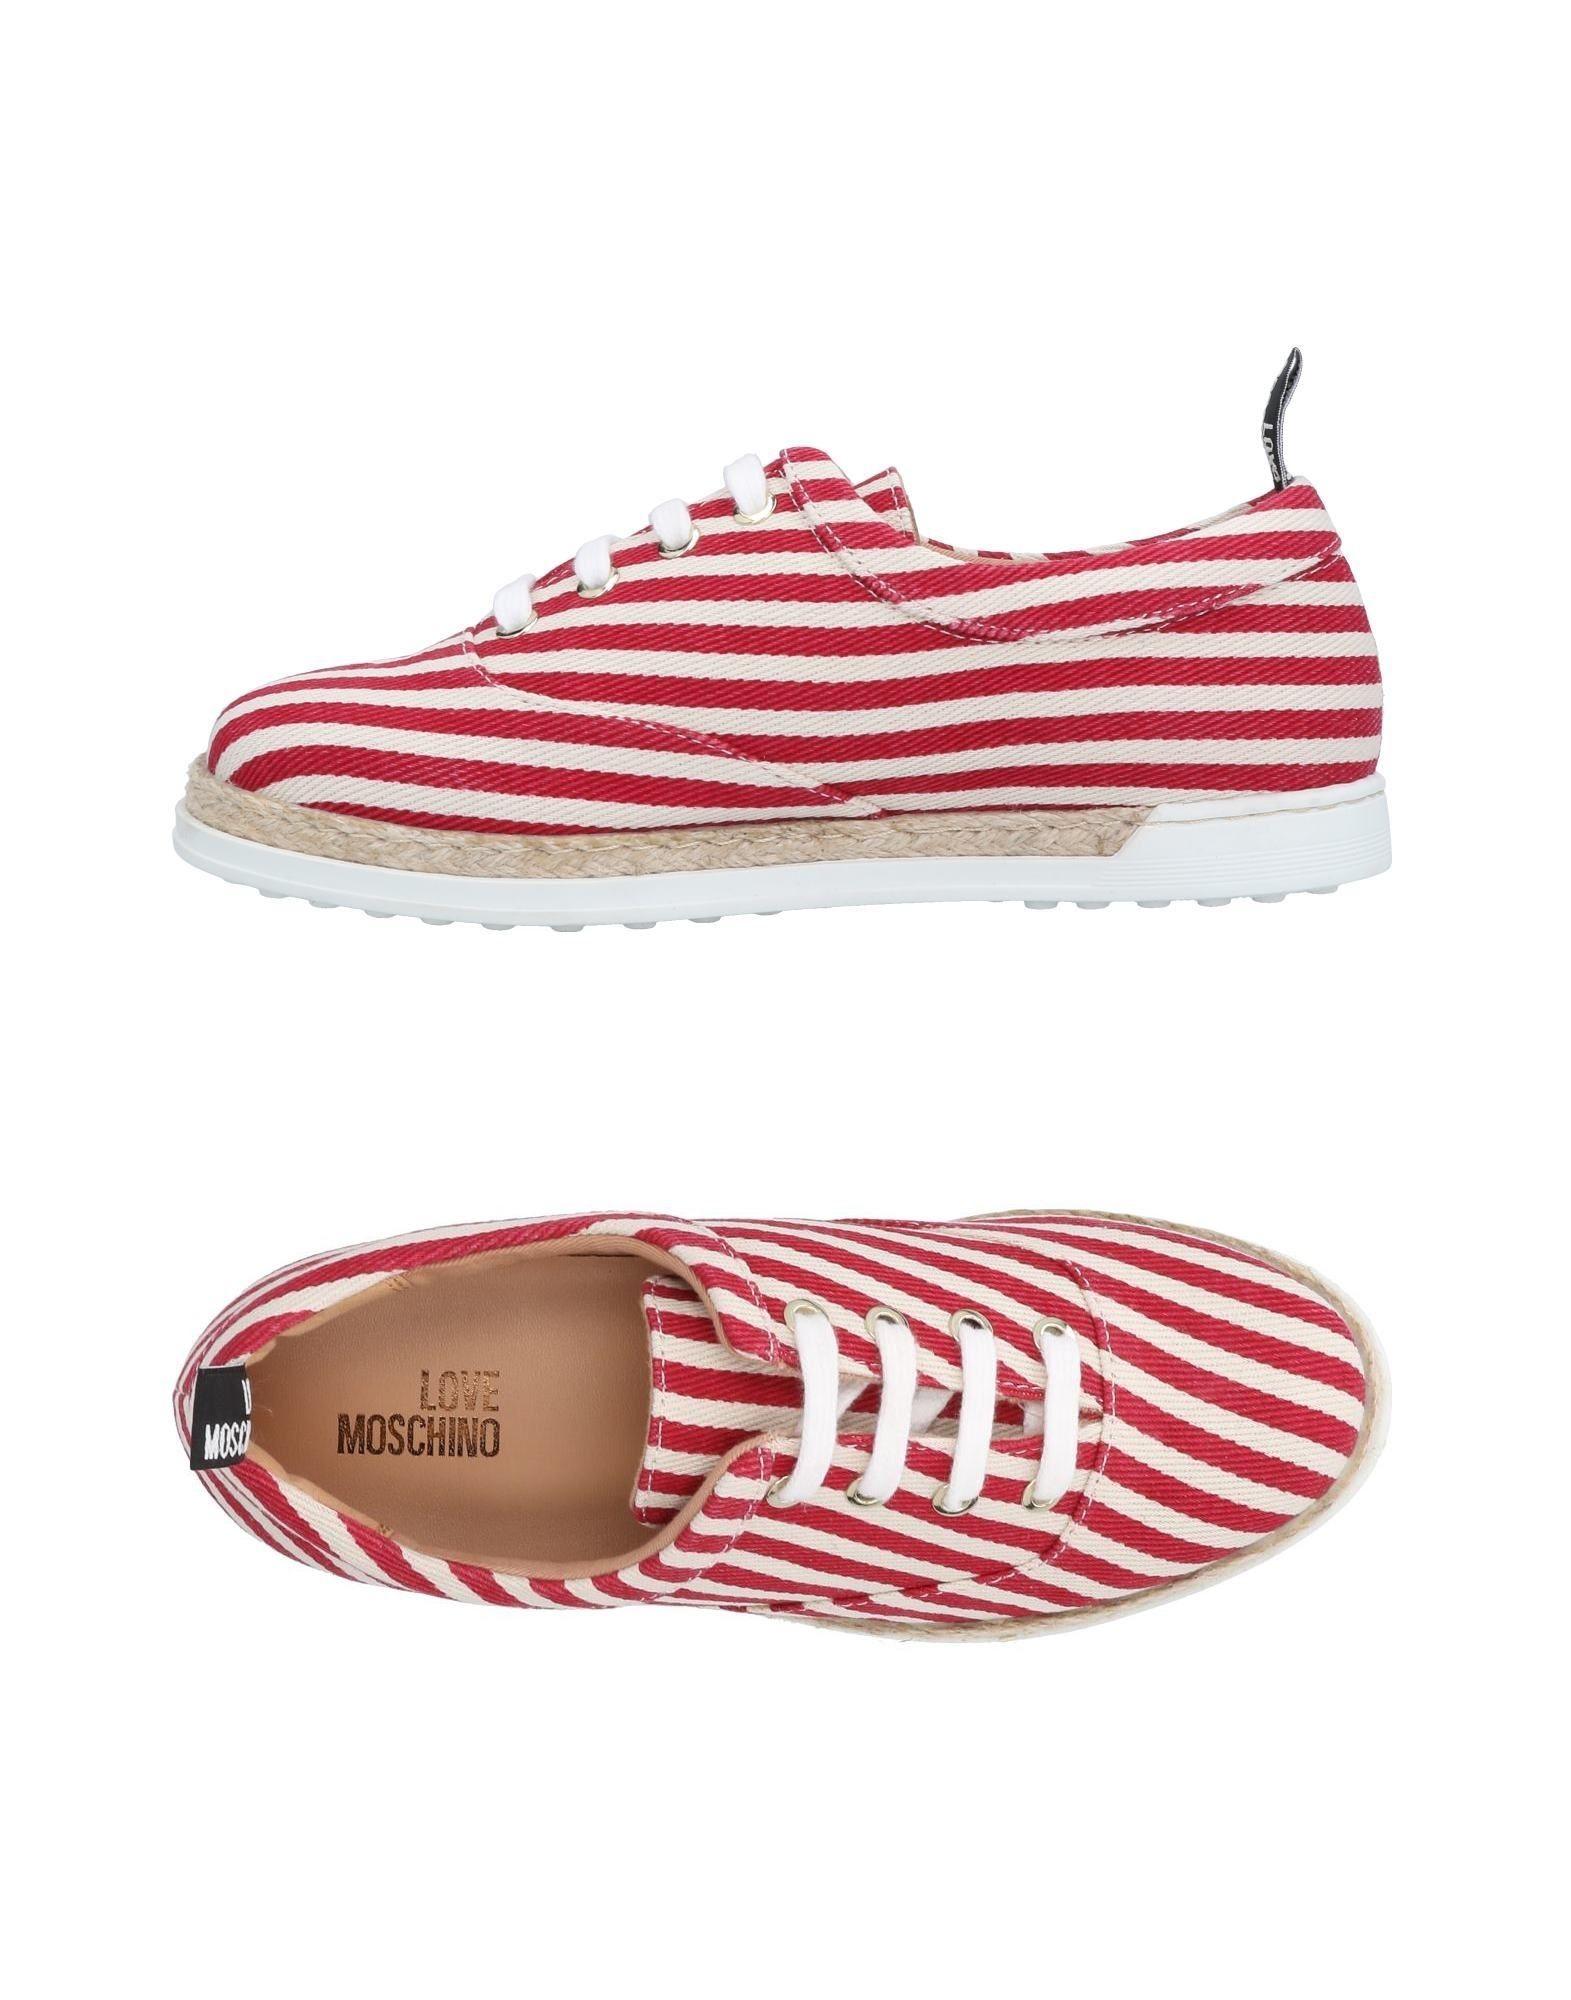 Love Moschino beliebte Schnürschuhe Damen  11495791CH Gute Qualität beliebte Moschino Schuhe 1fde62